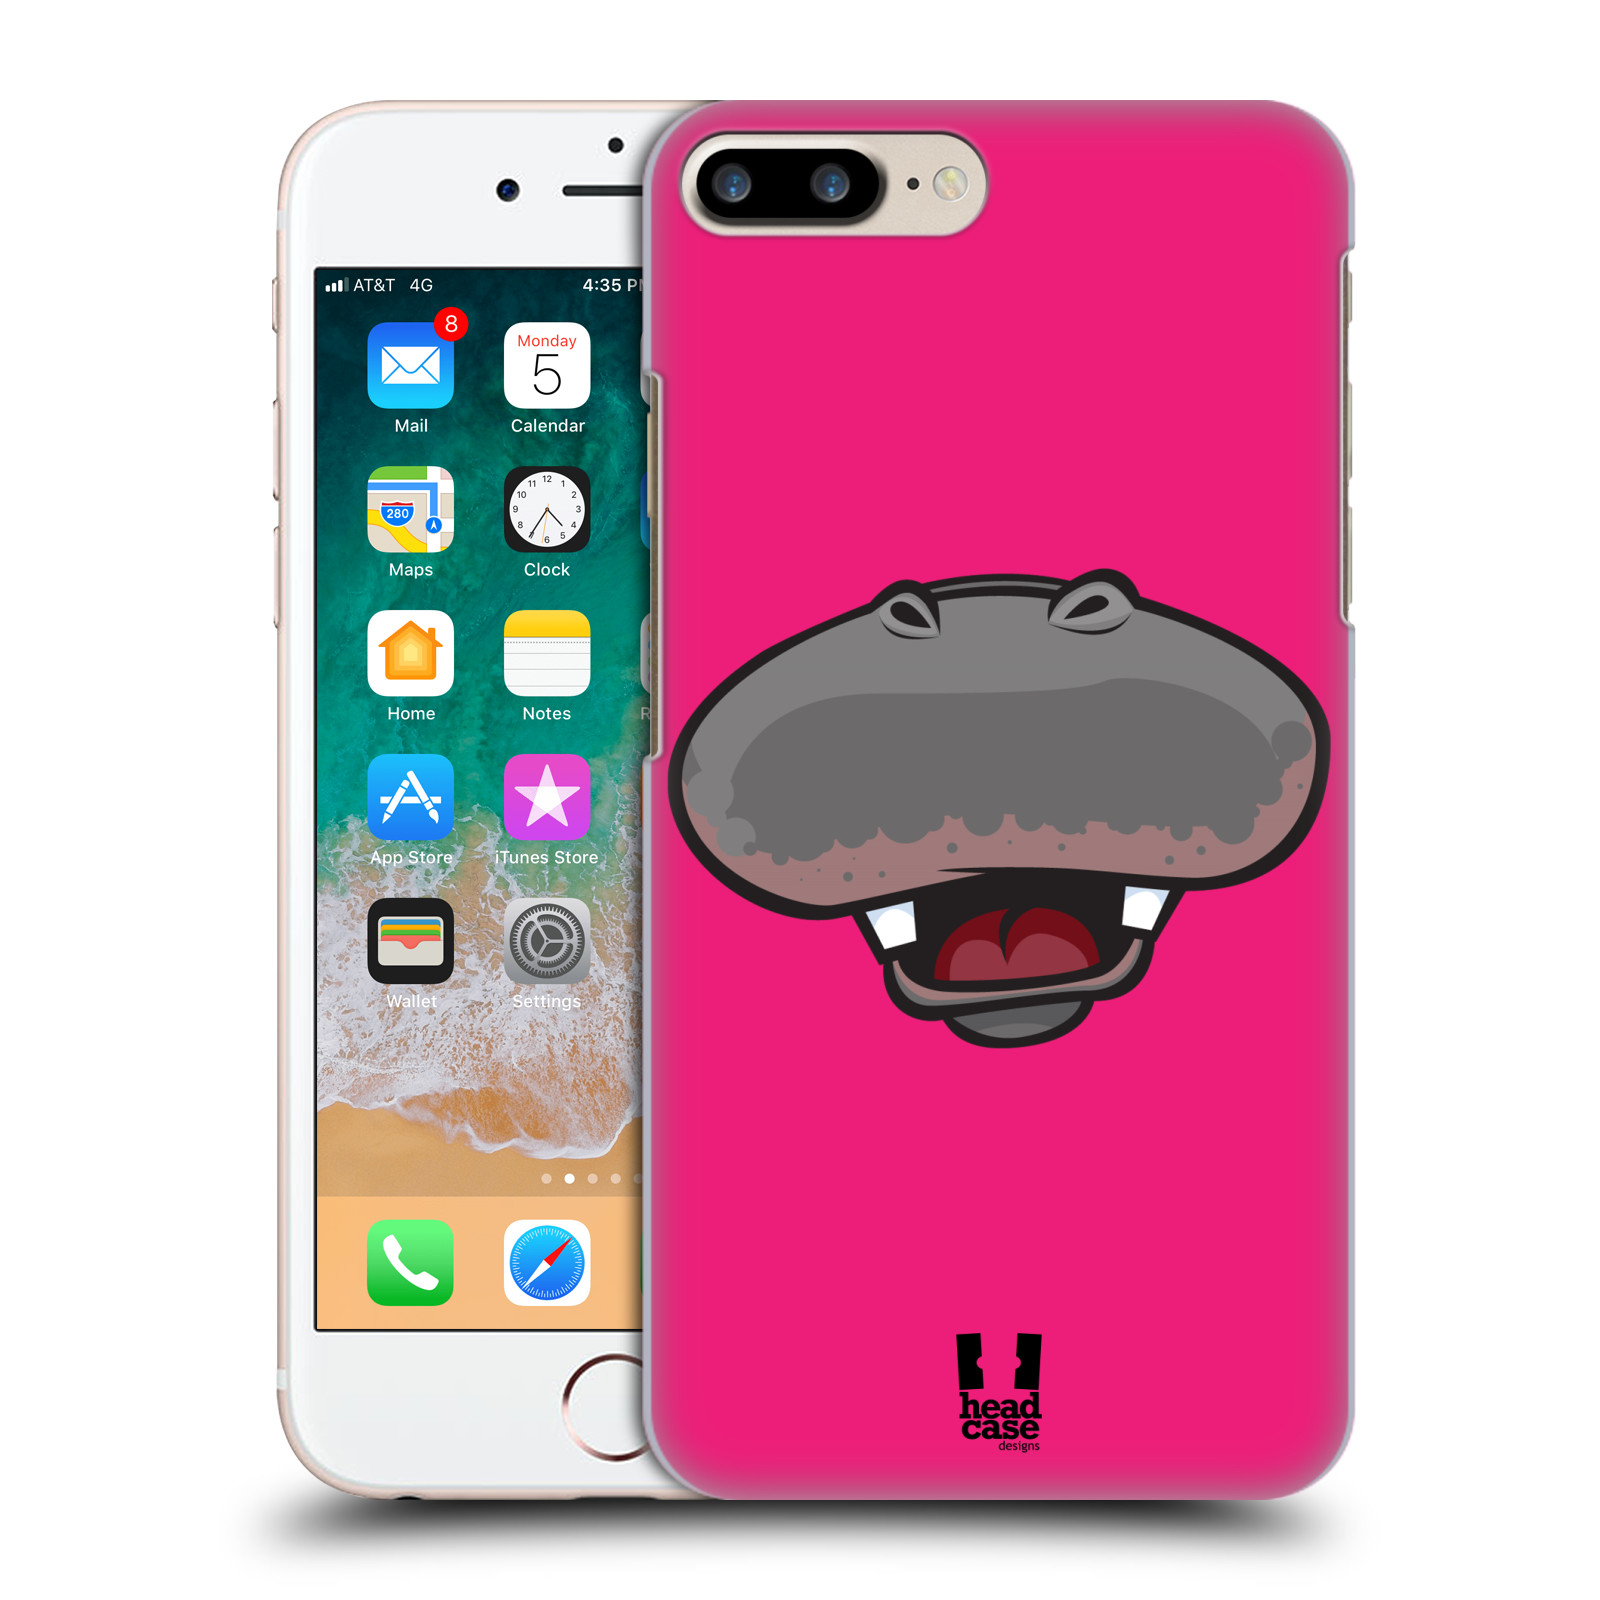 HEAD CASE plastový obal na mobil Apple Iphone 7 PLUS vzor Zvířecí úsměv hroch růžová